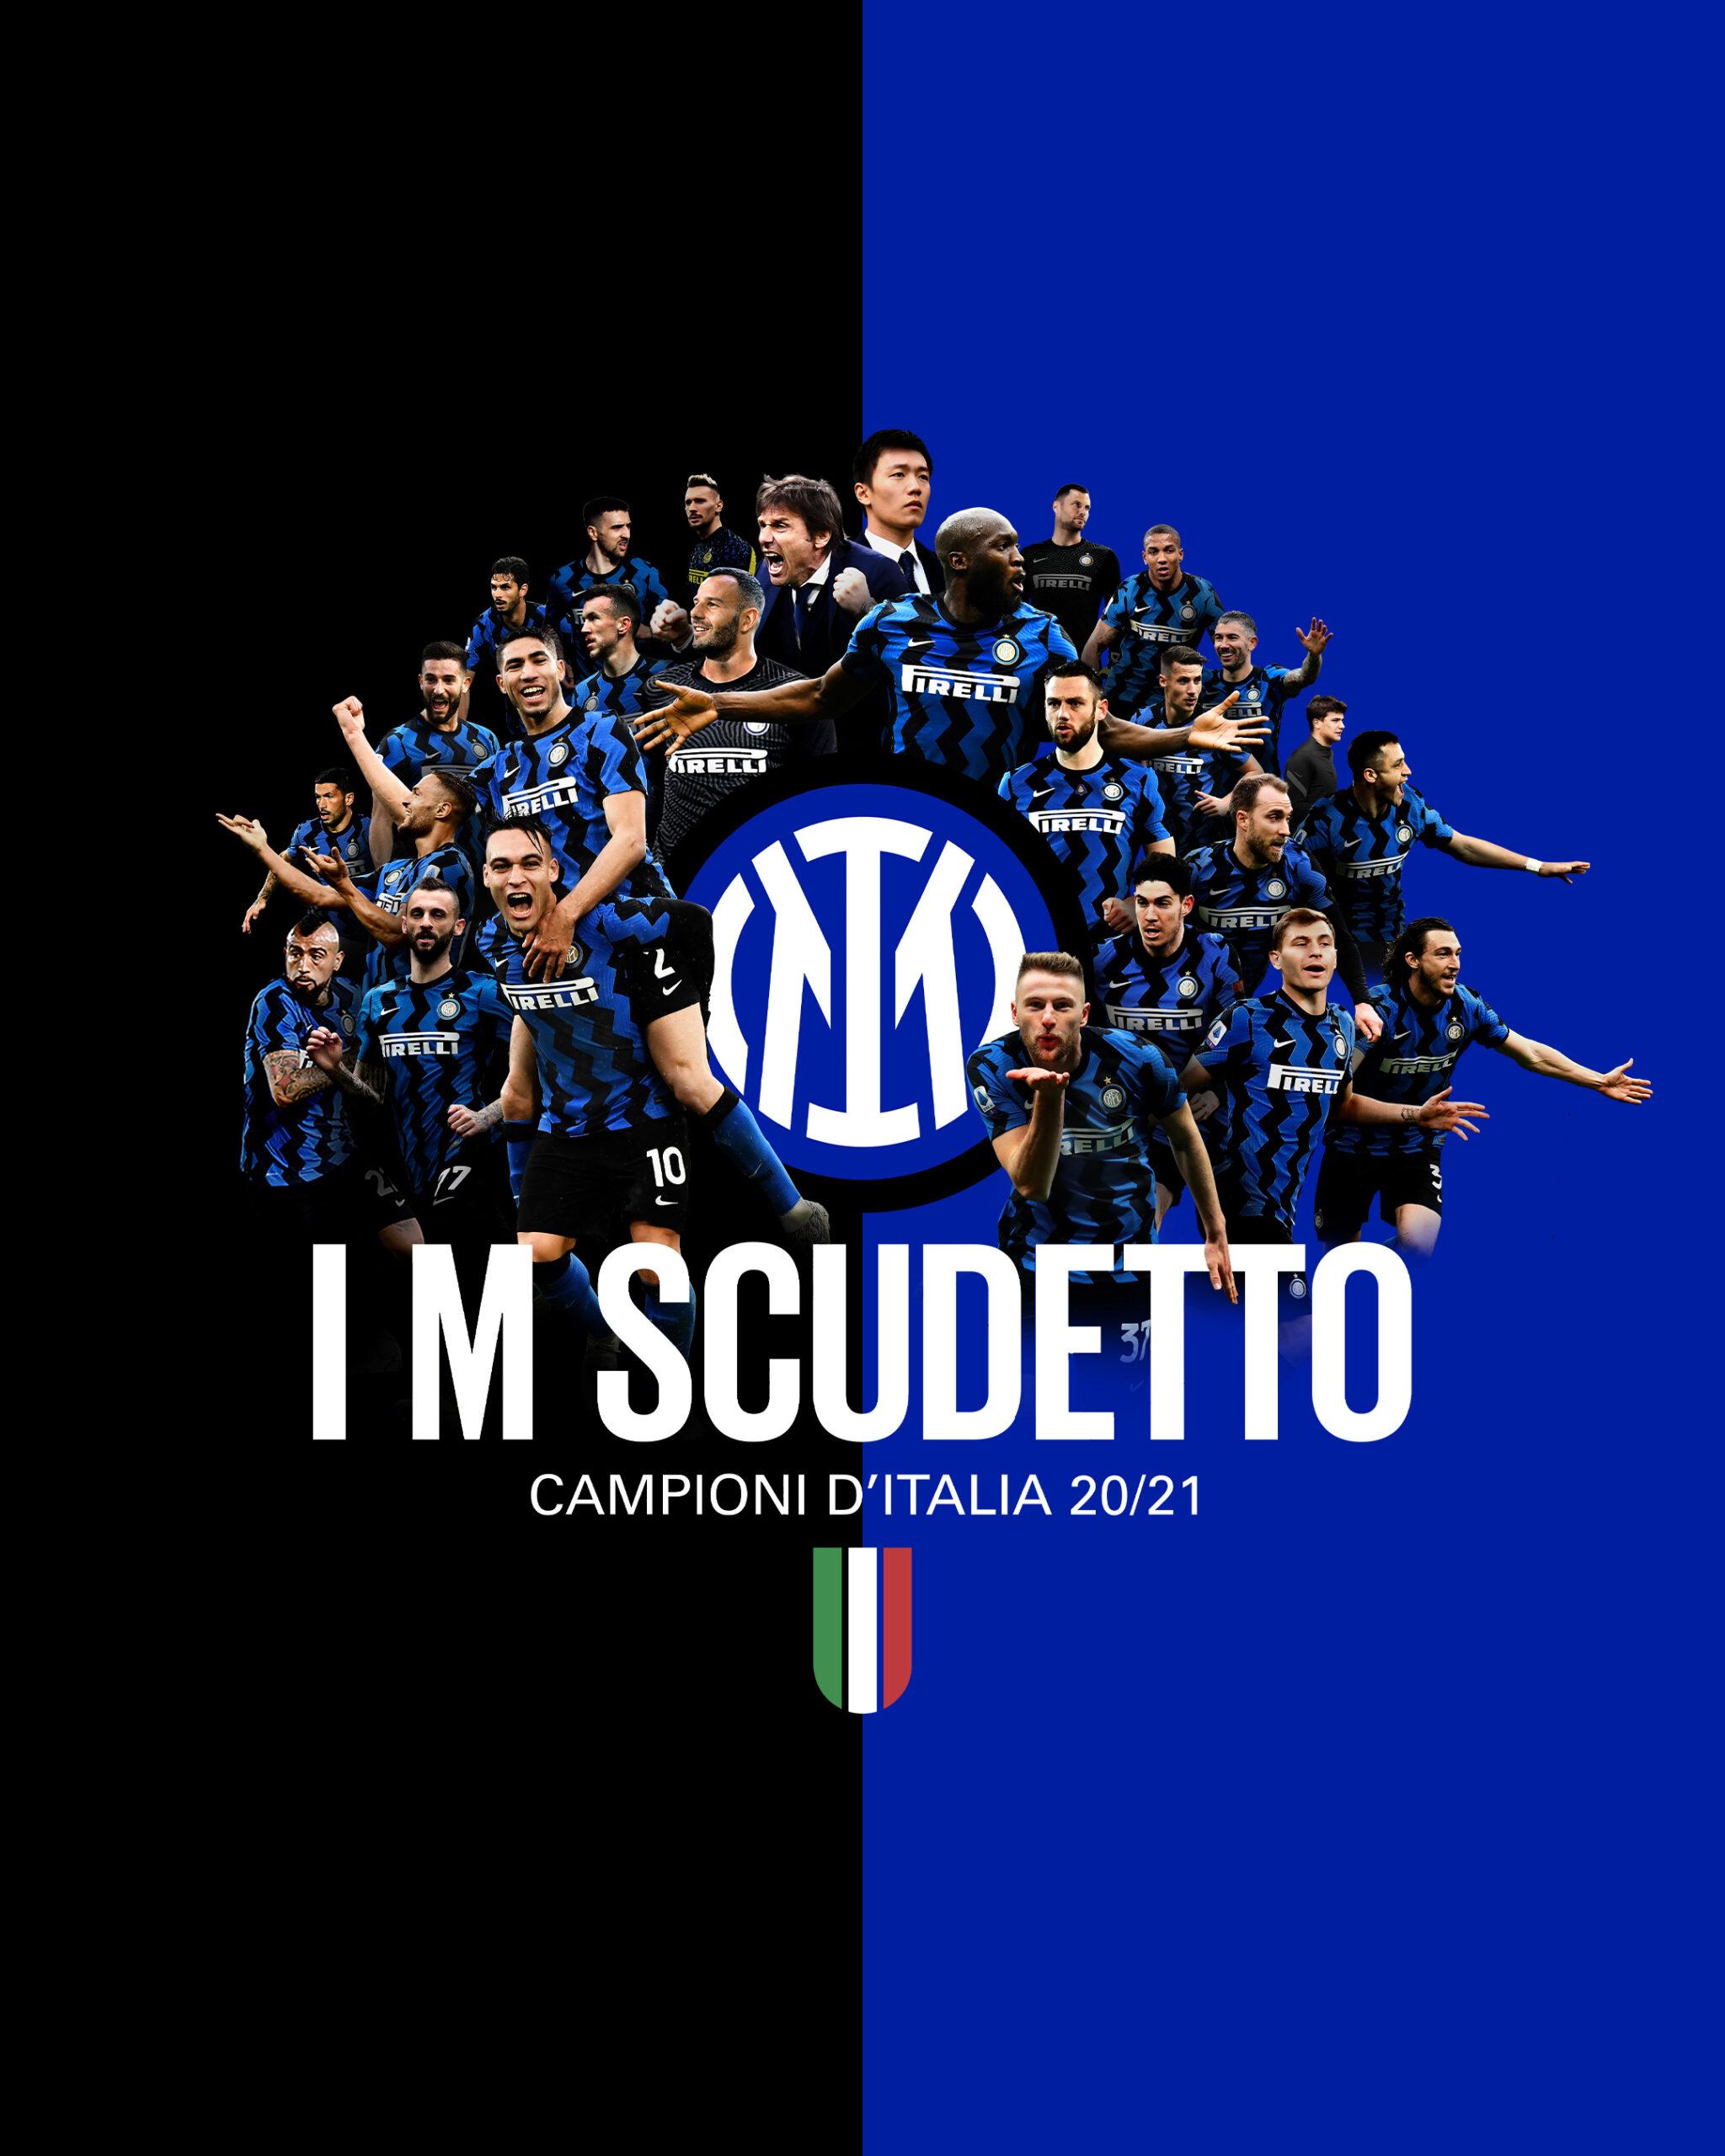 inter-campione-d'italia-2020-2021-tifosi-radunati-in-piazza-duomo.